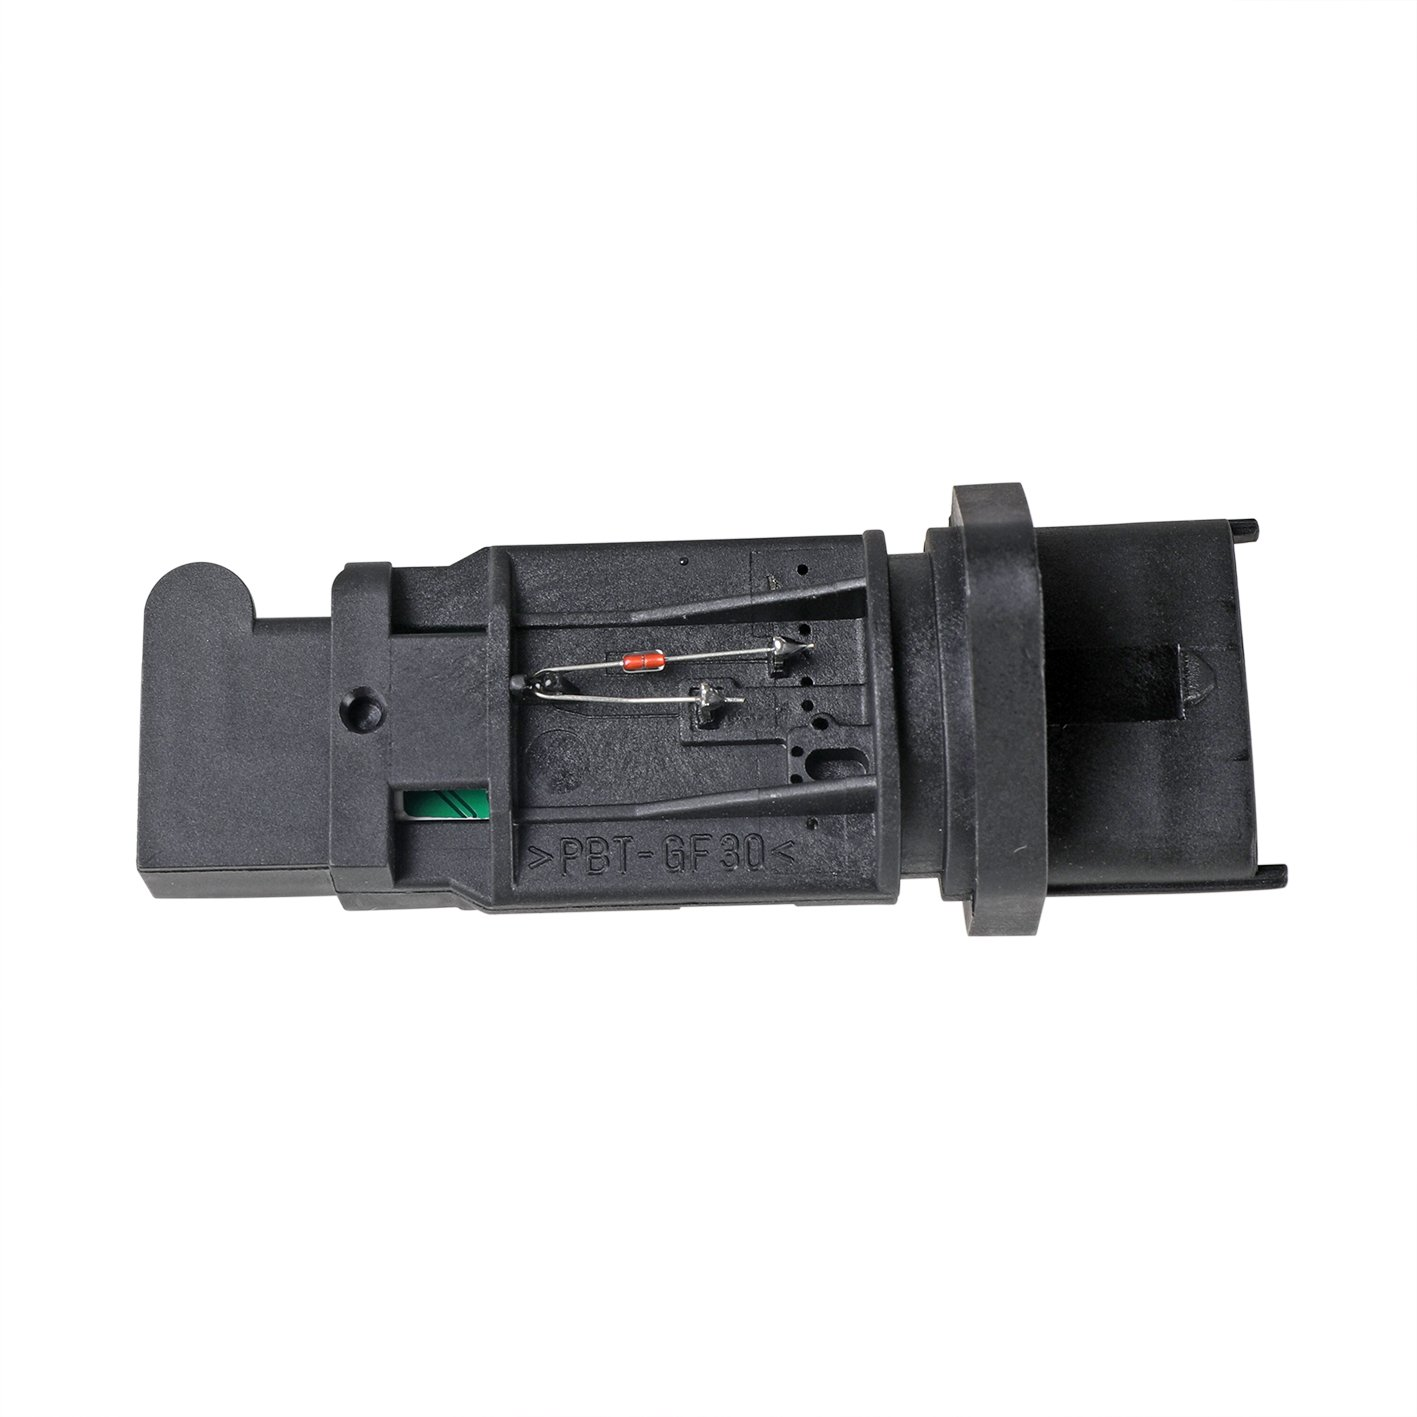 MAF SENSOR ASSY AutoPart T CS1090 New MAF Mass air flow Sensor Assembly for 2000 2001 2002 Hyundai Accent 1.5L V4